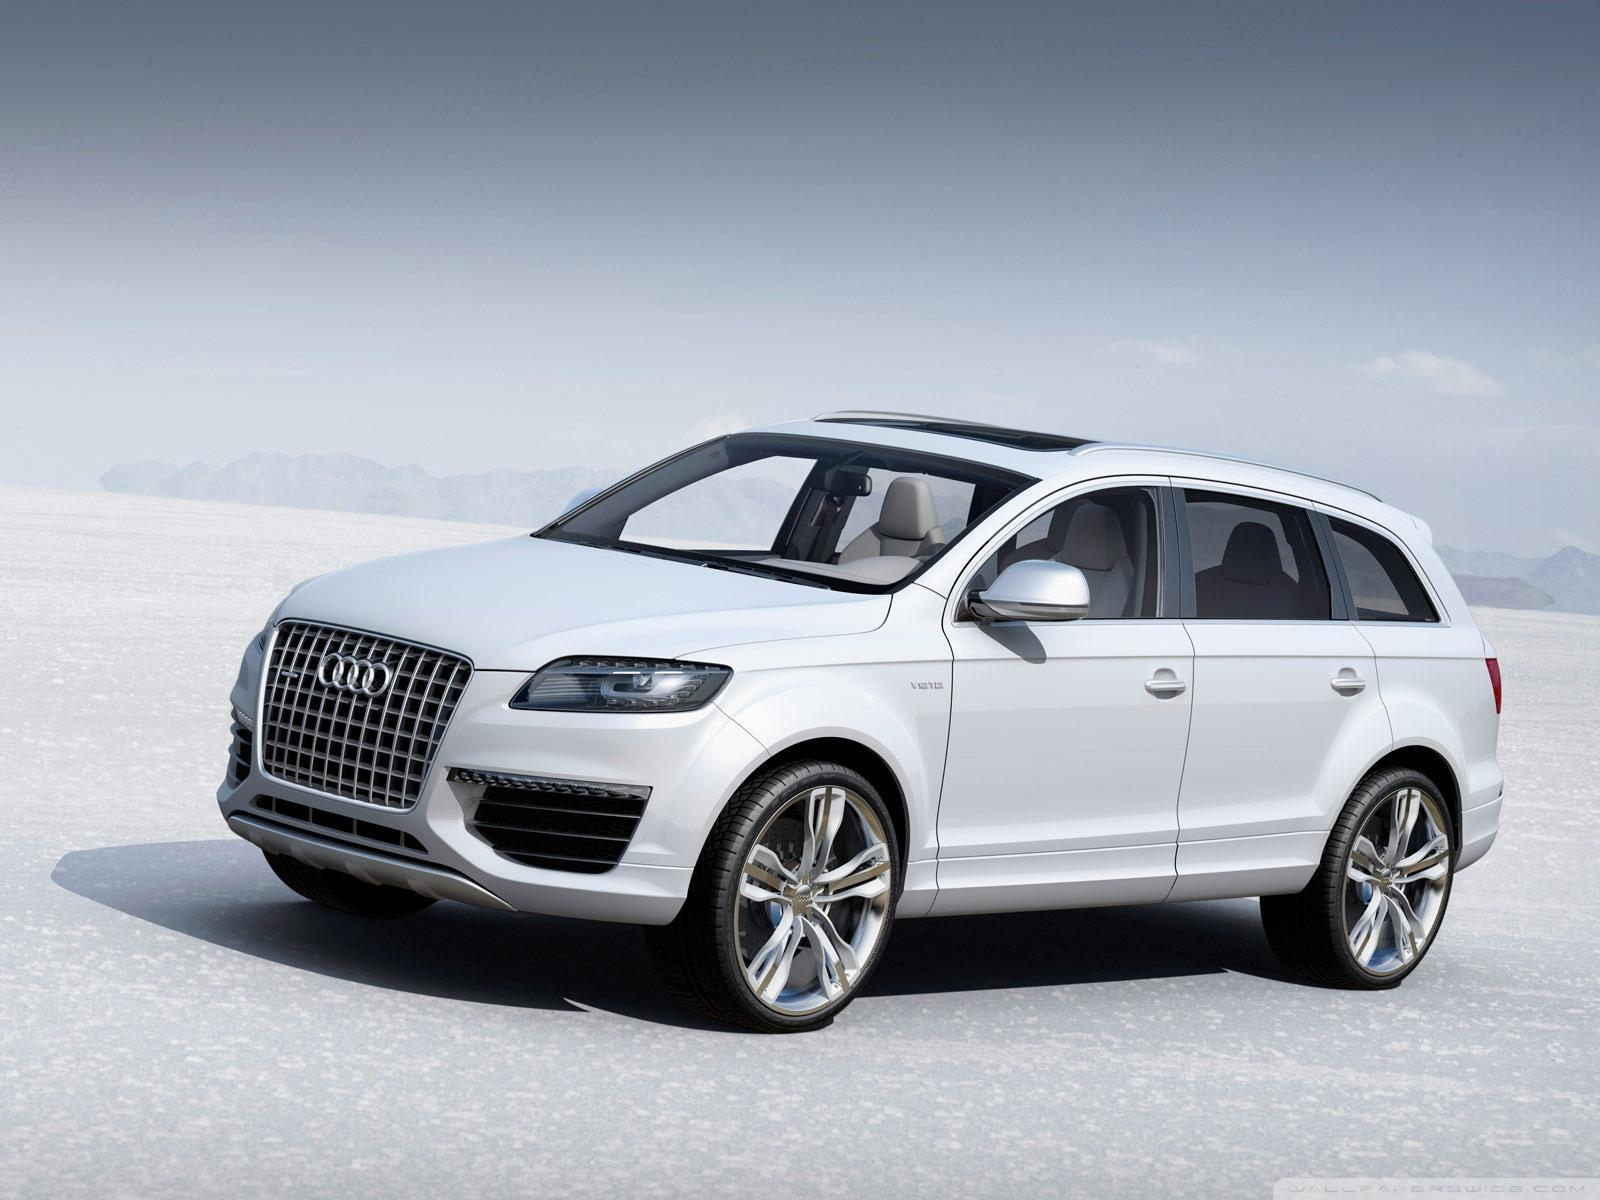 Download Audi Cars Motors 10 Wallpaper Cars Wallpapers For Your